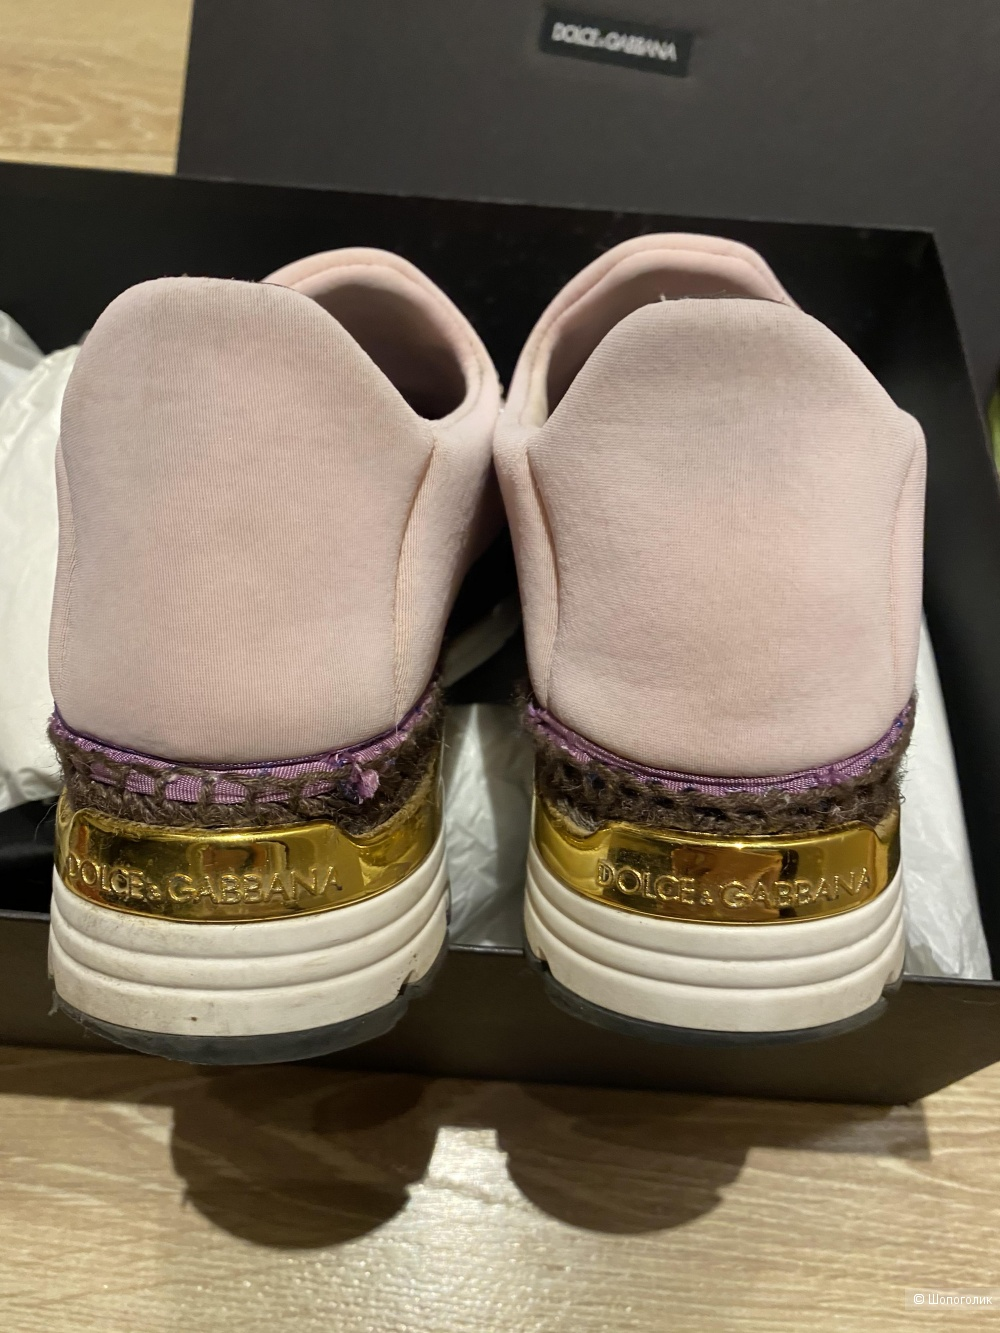 Кроссовки Dolce&Gabbana на 36